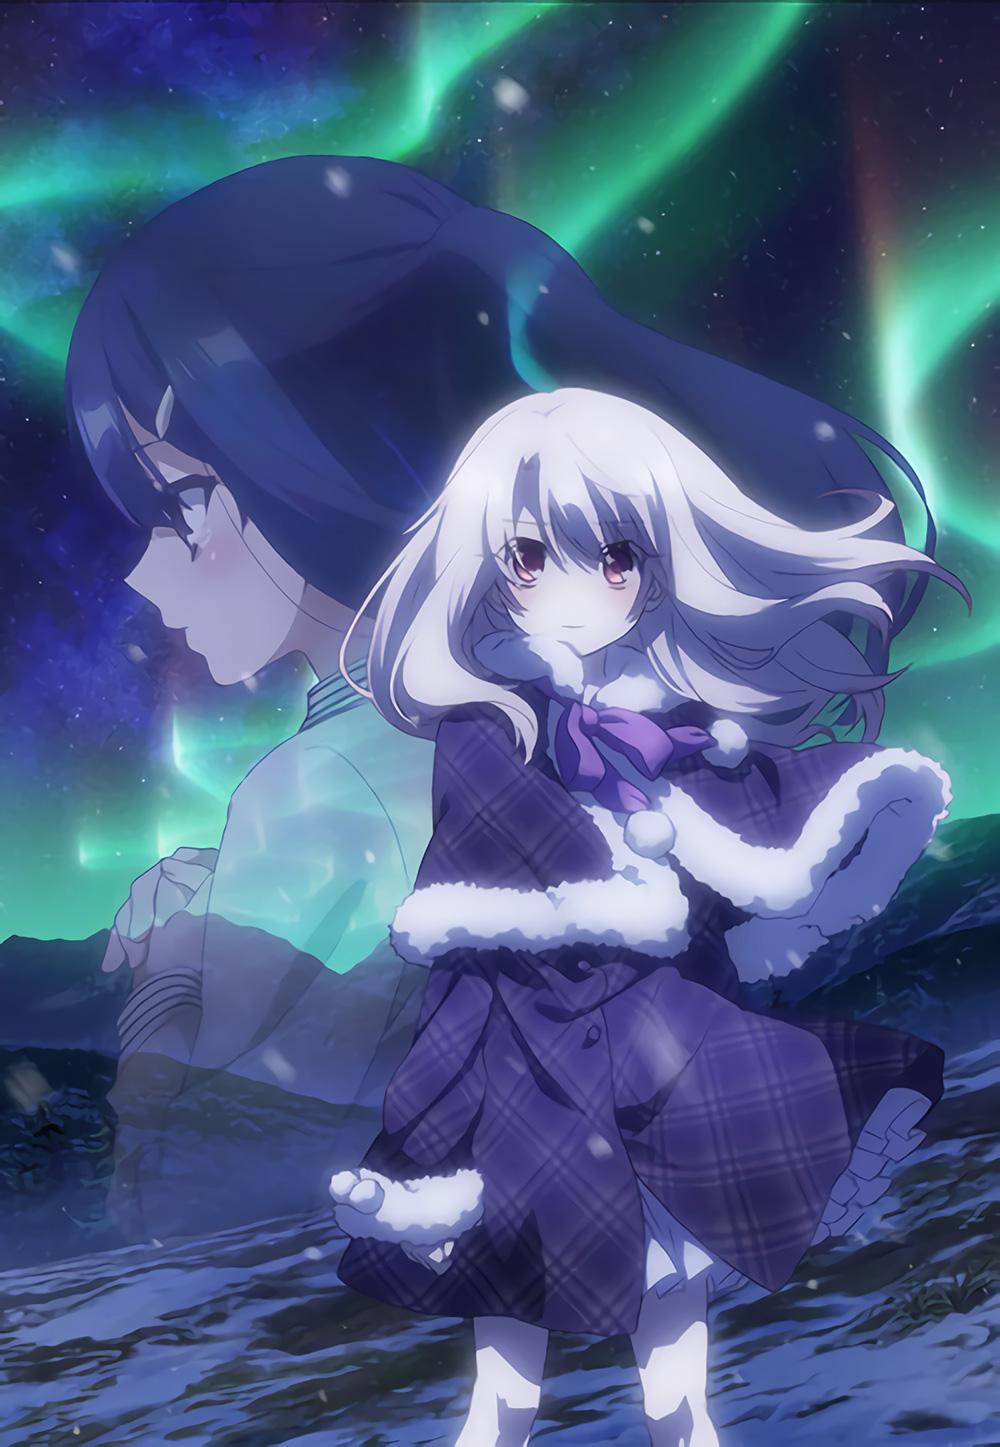 Fate-kaleid-Liner-Prisma-Illya-3rei-Anime-Visual-02